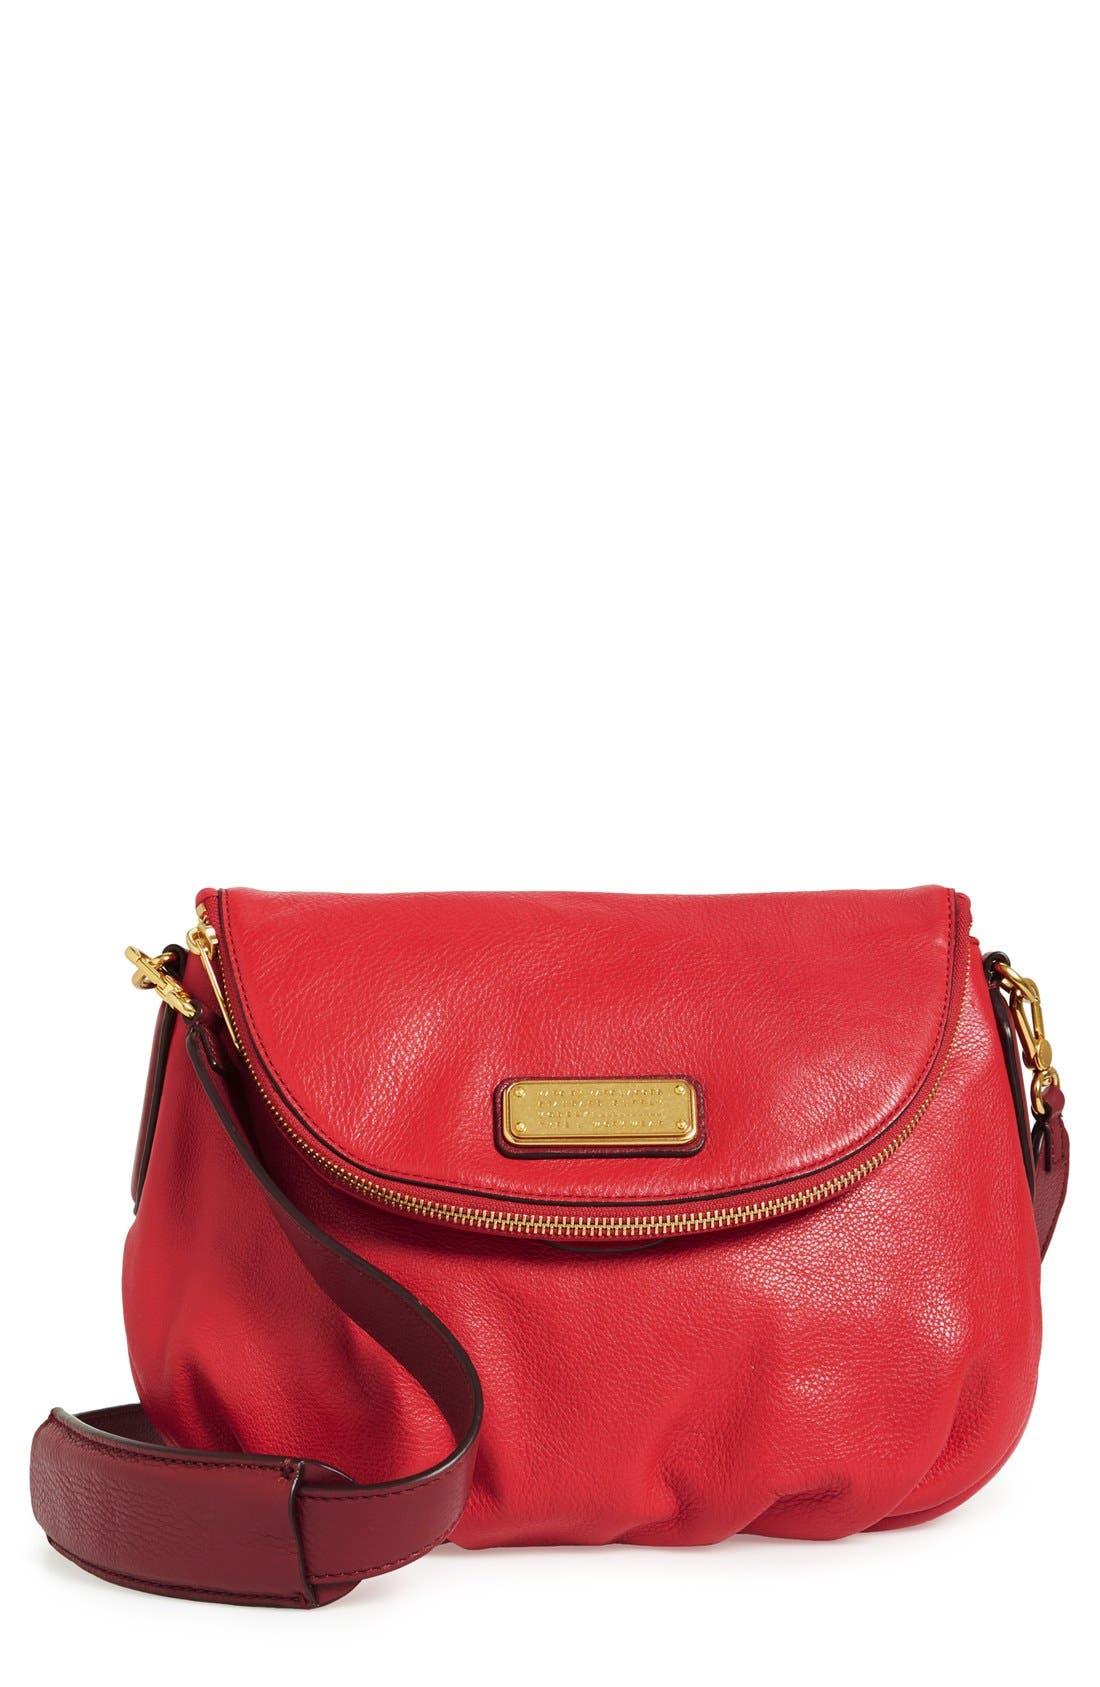 Main Image - MARC BY MARC JACOBS 'New Q - Natasha' Crossbody Bag